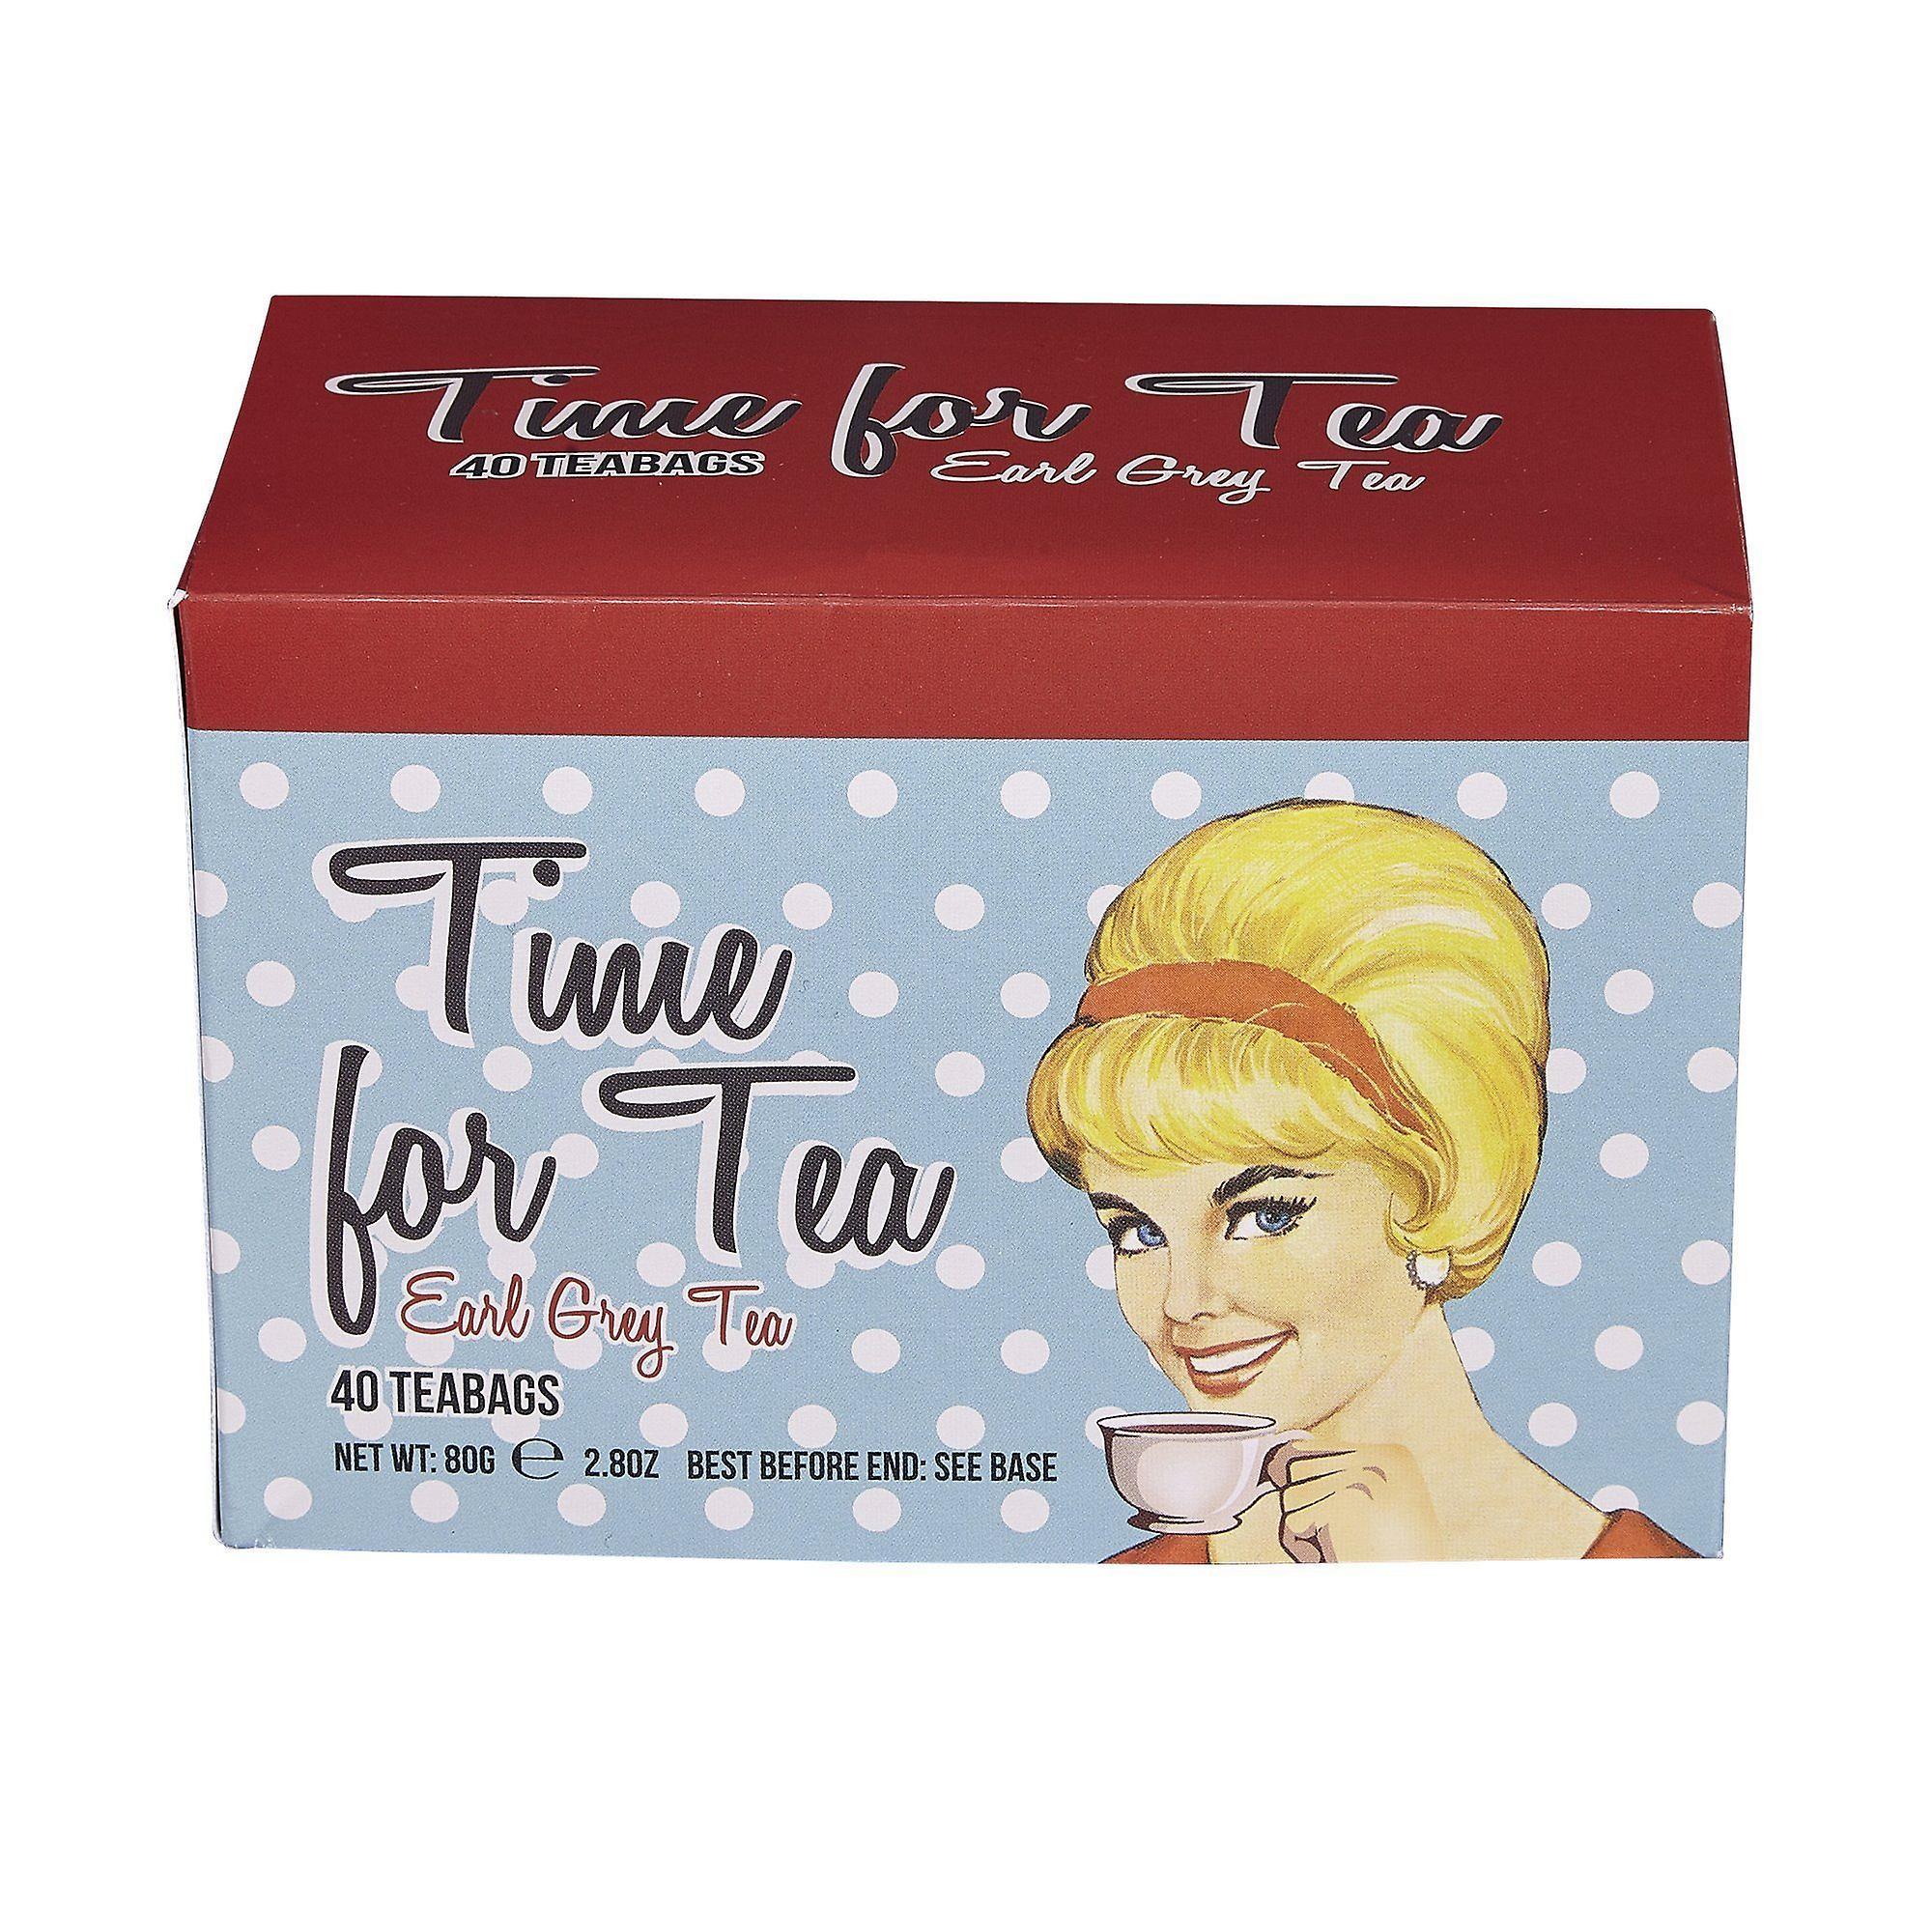 Time for tea earl grey tea 40 teabag carton